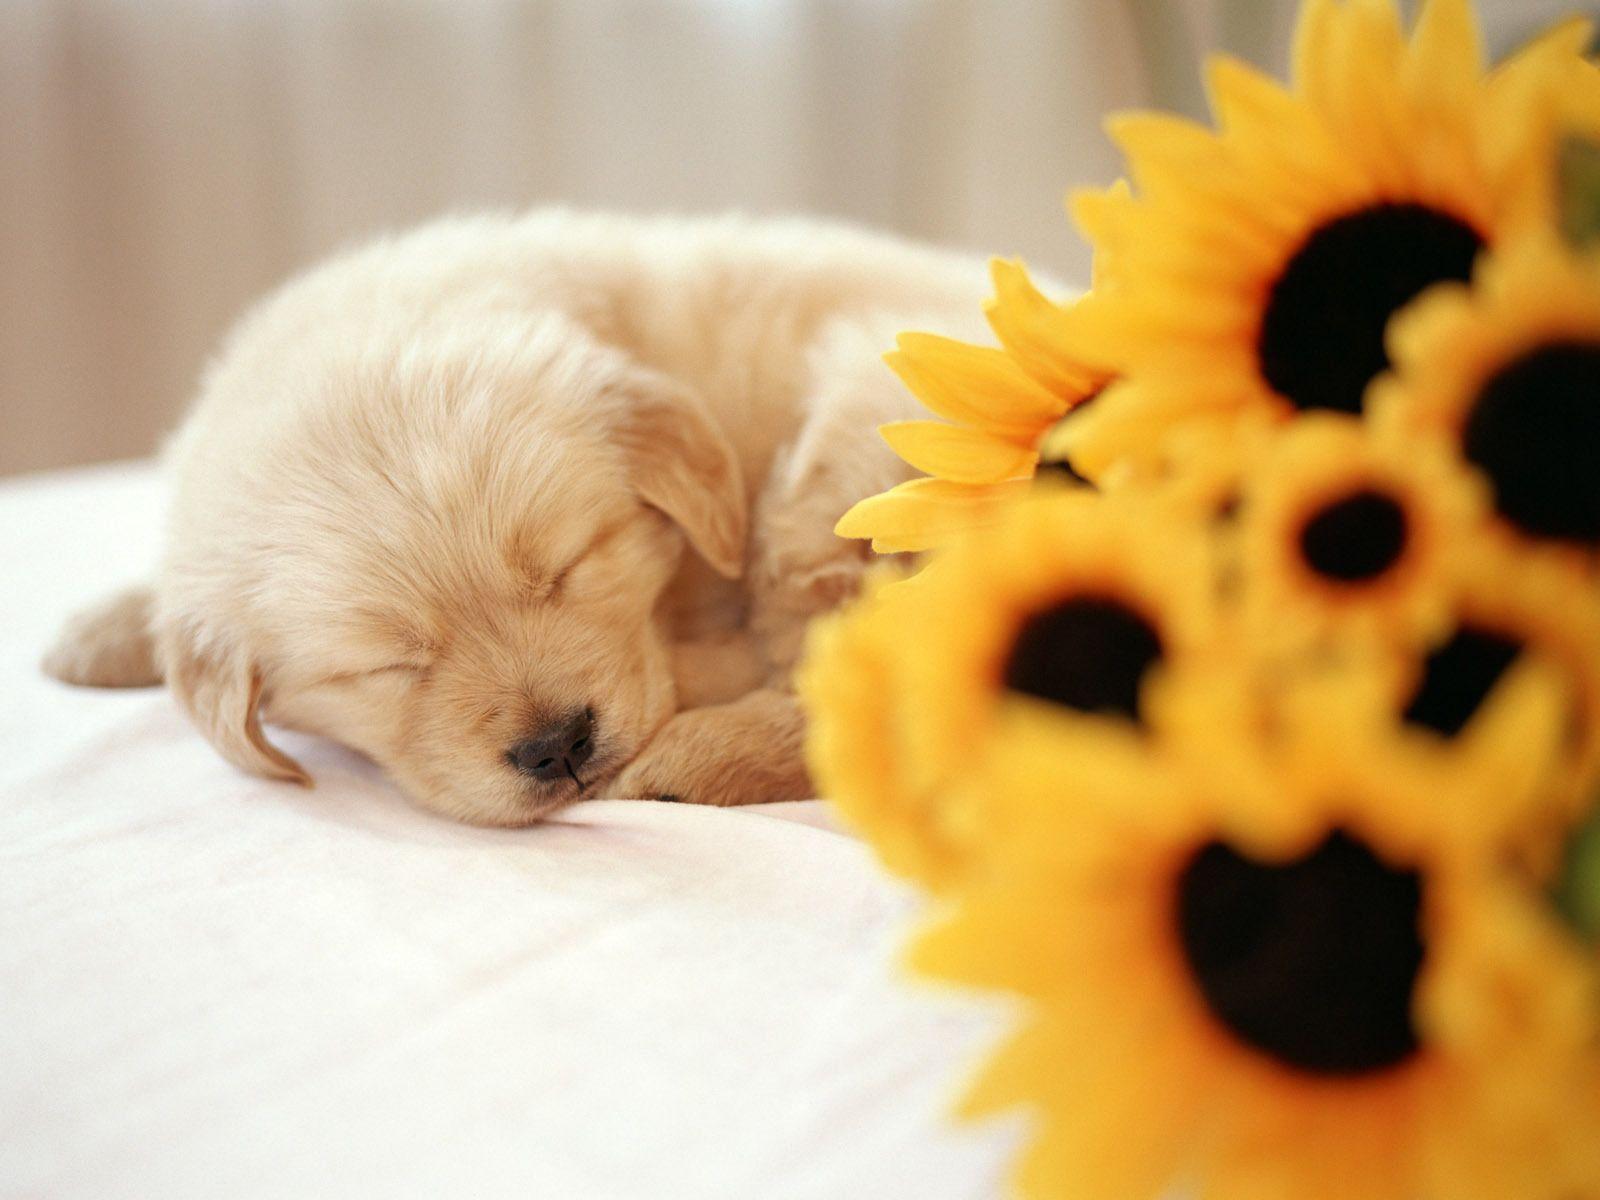 So cute puppies wallpaper 15897245 fanpop - So Cute Puppies Wallpaper 14749024 Fanpop